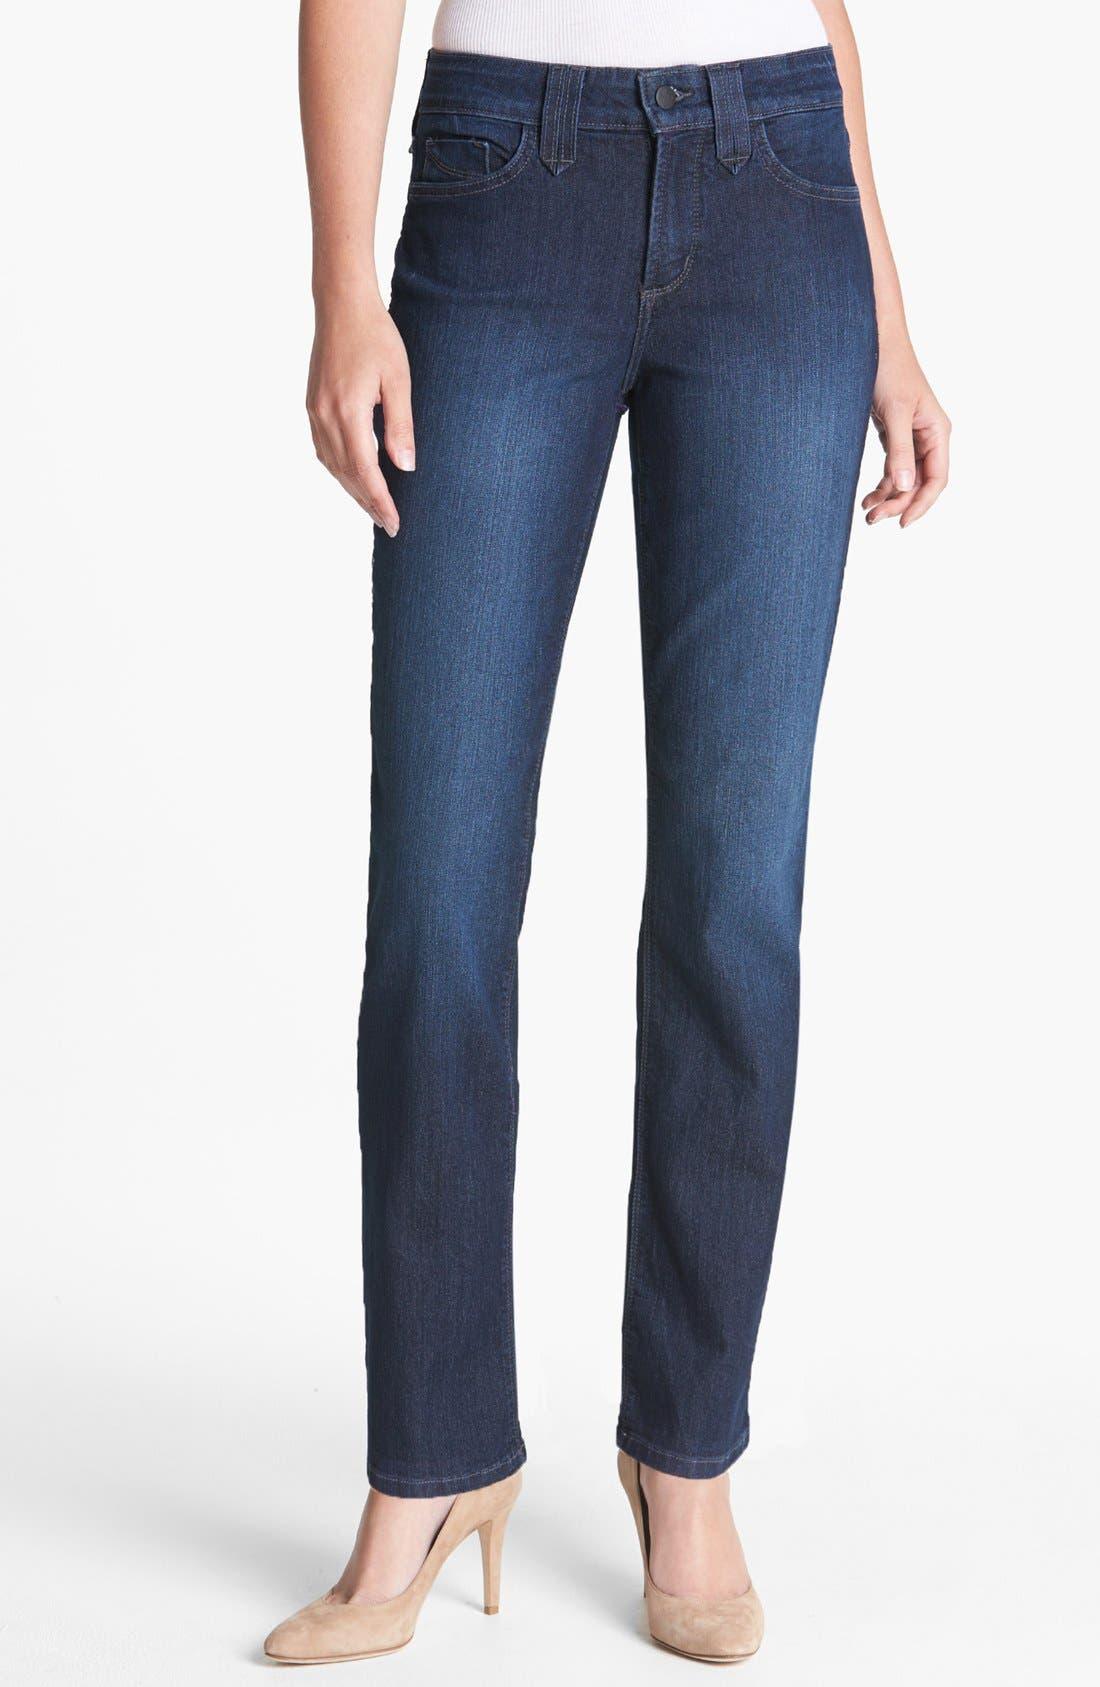 Alternate Image 1 Selected - NYDJ 'Hayden' Stretch Straight Leg Jeans (Burbank) (Short)